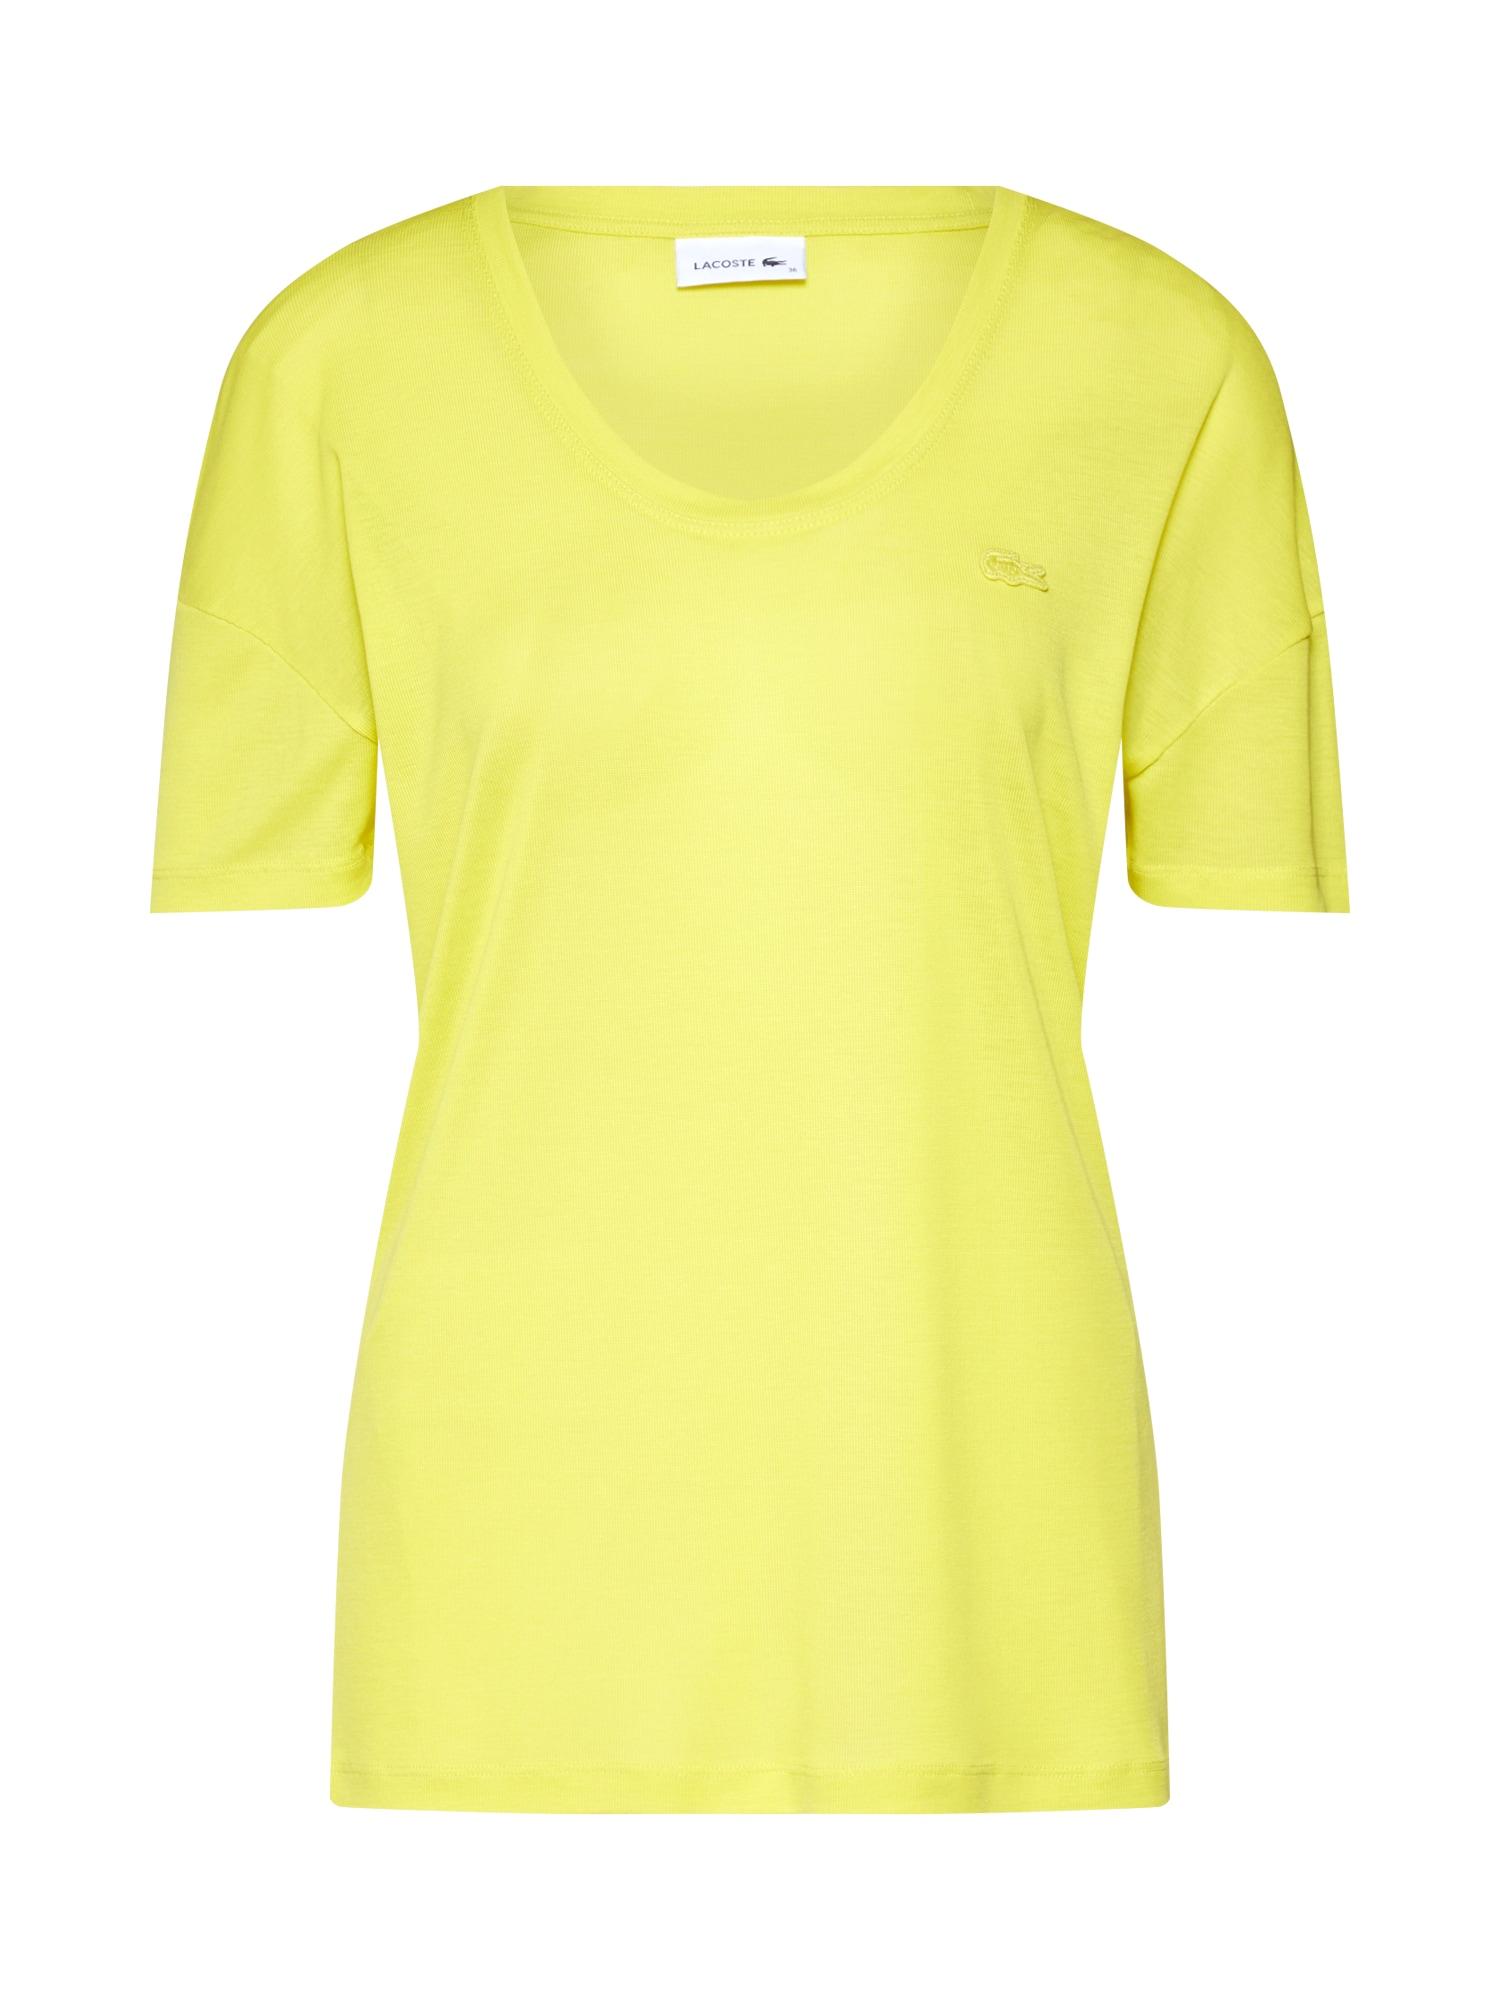 Tričko TEE-SHIRT žlutá LACOSTE